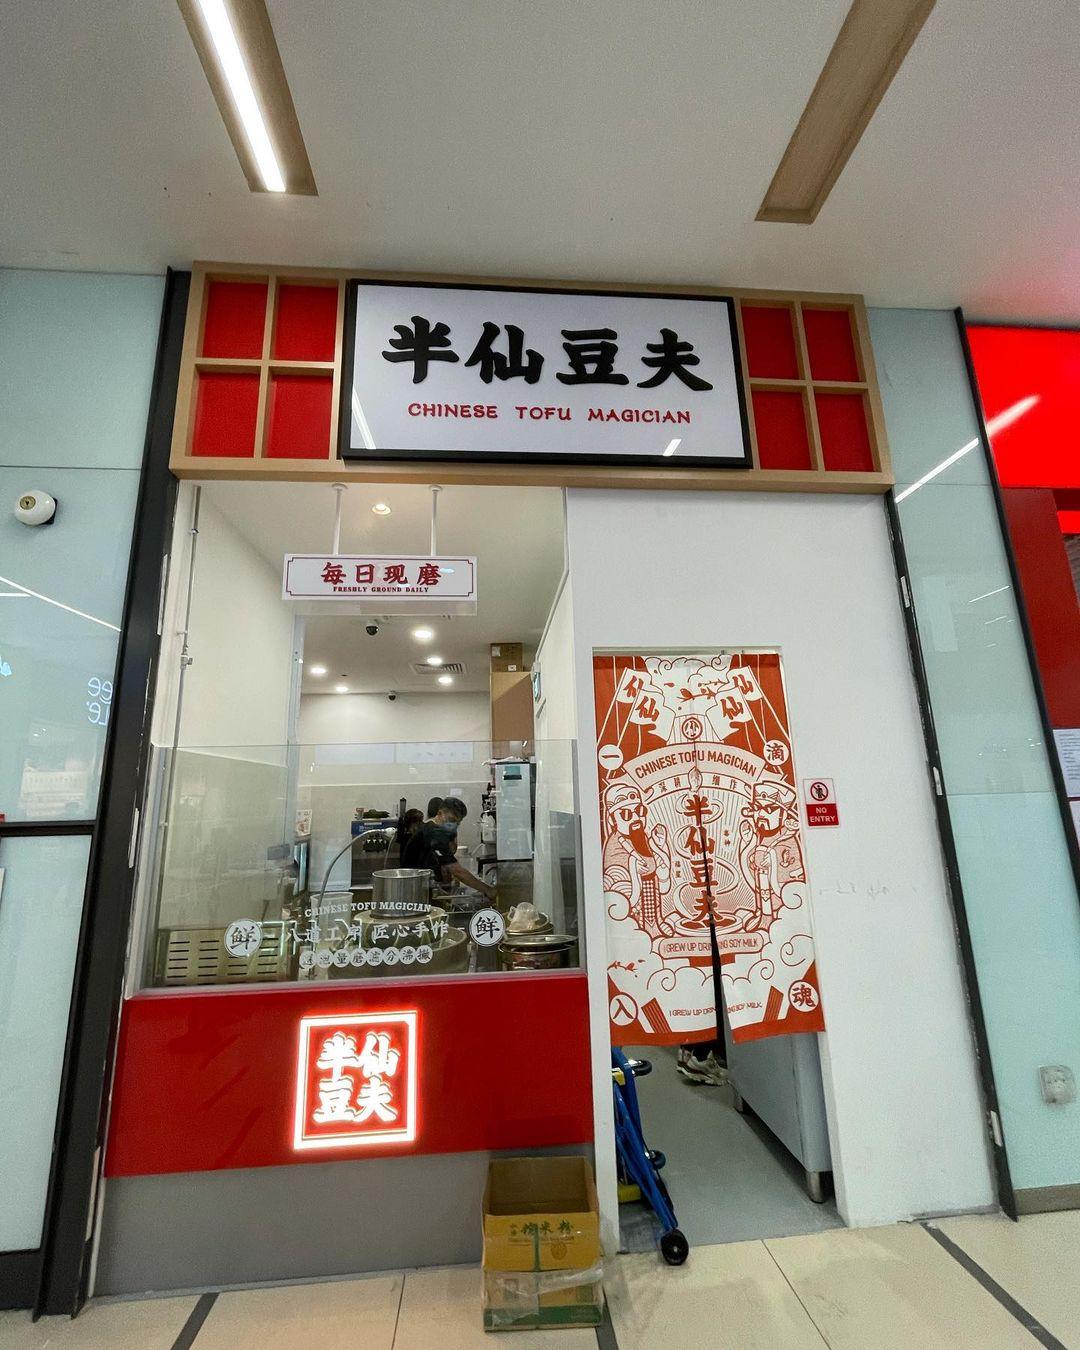 Chinese Tofu Magician